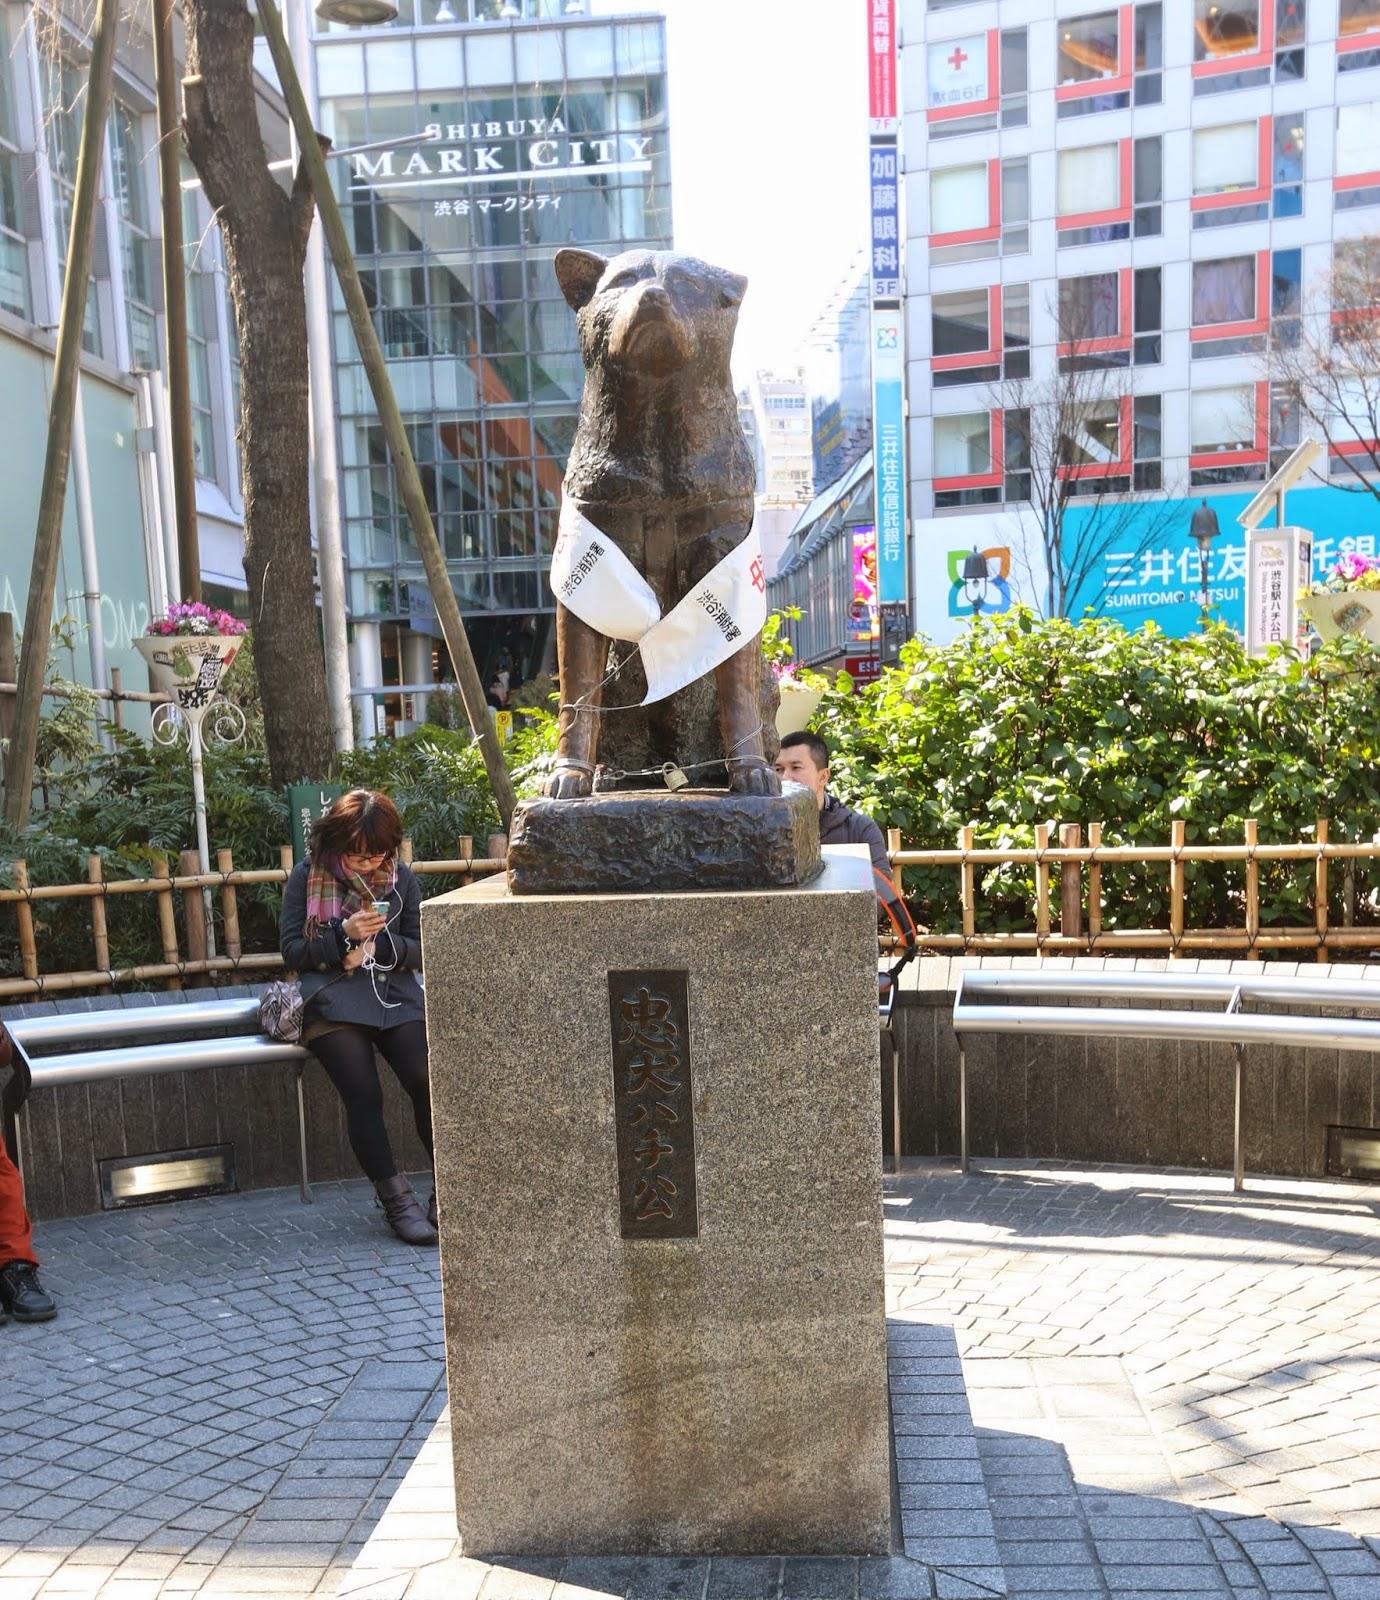 Hachiko Shibuya in Tokyo, Japan | Lense Moments